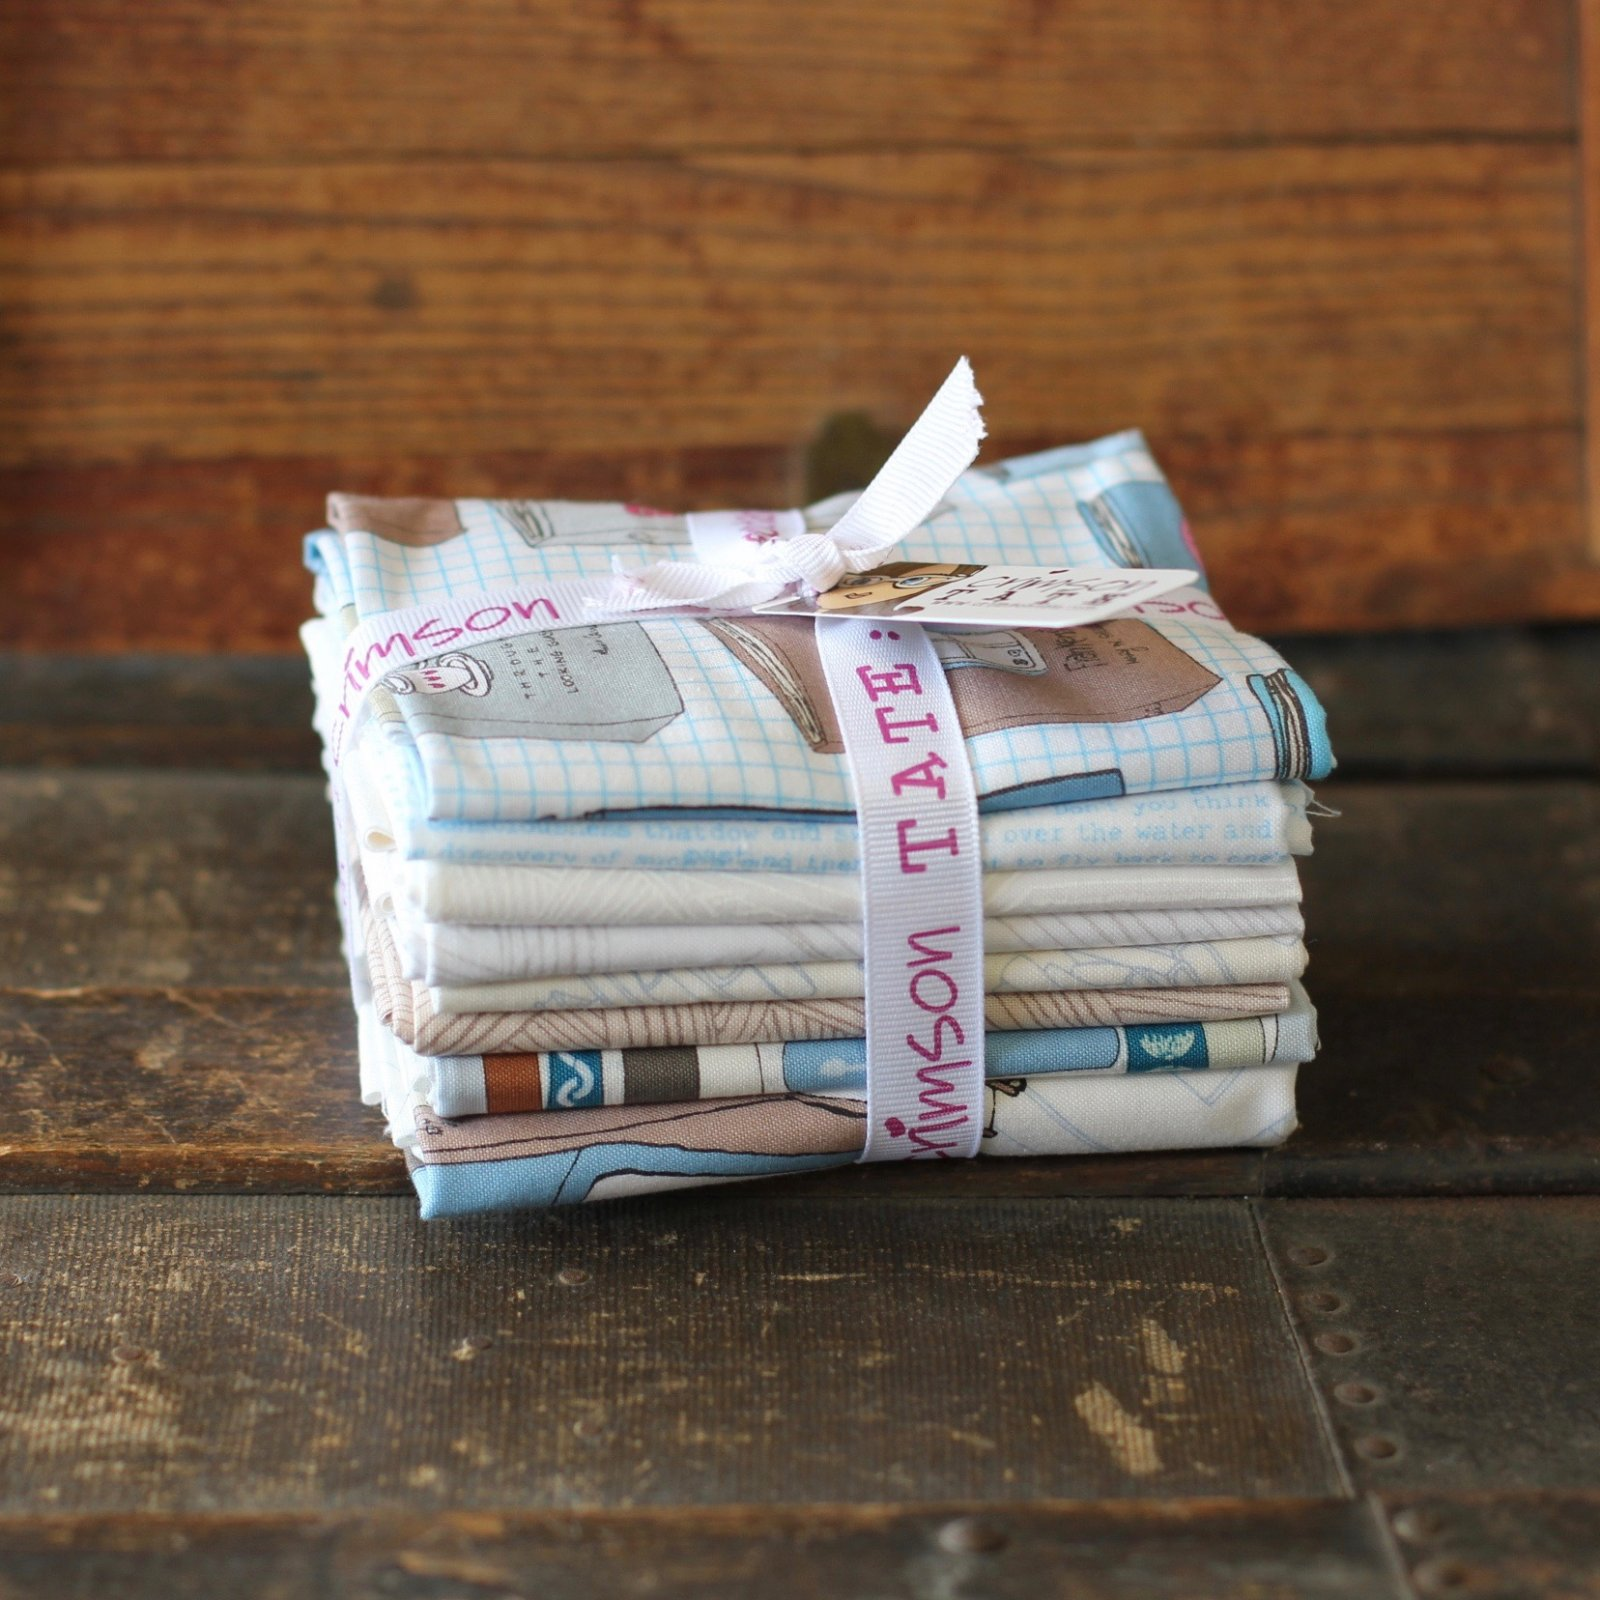 Heather Givans Literary - Summer Reading 7 pc. Fat Quarter + 1 Half Yard Bundle (Quiet Down)